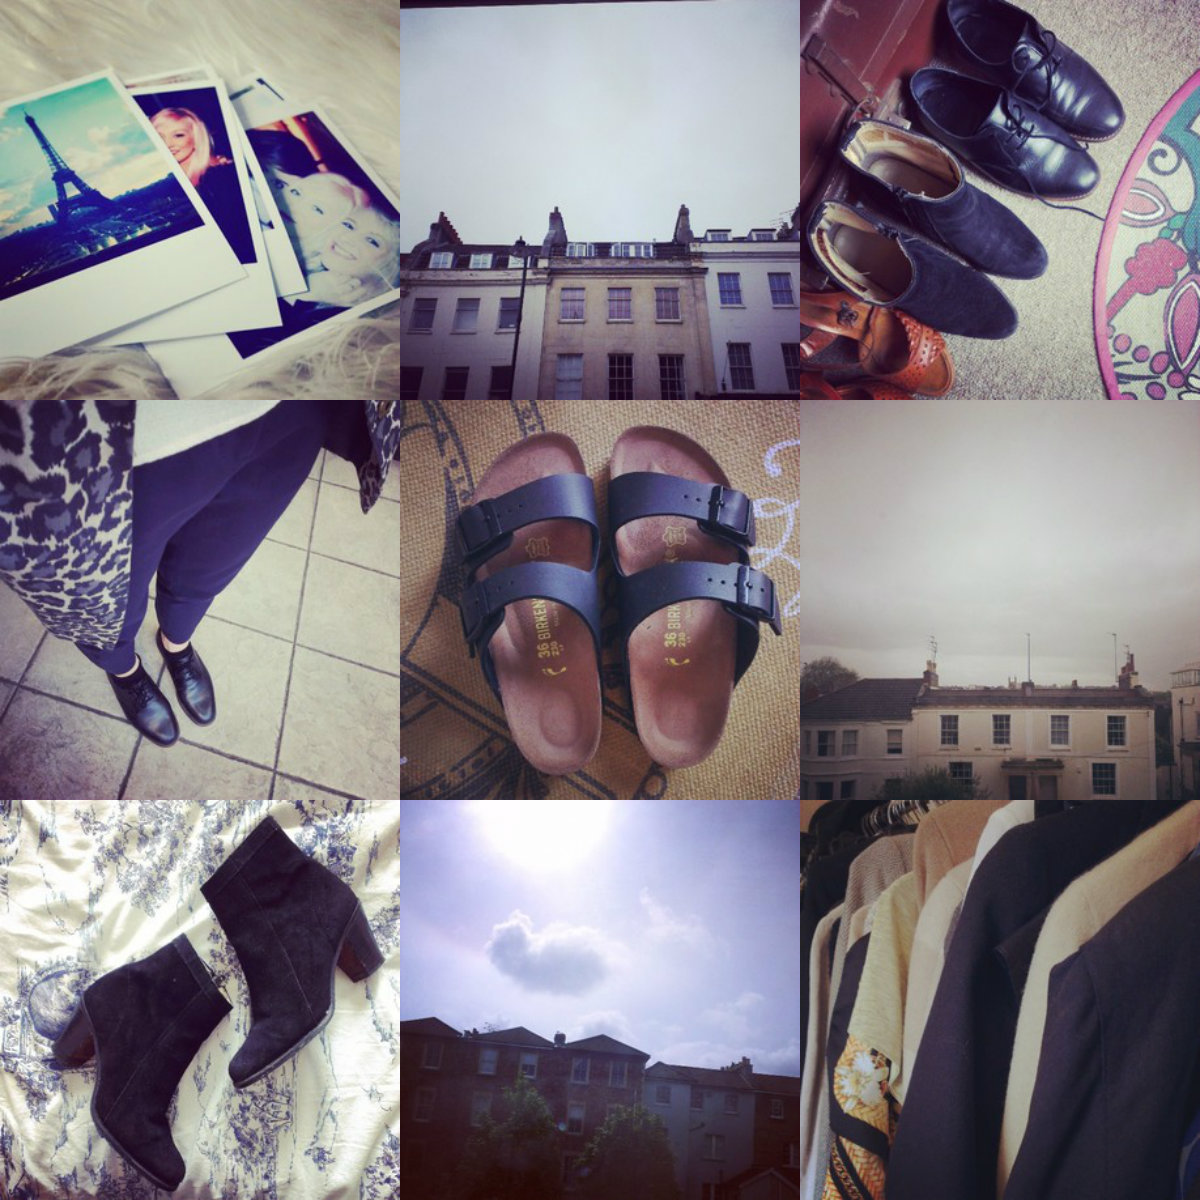 instagram, printic, birkenstocks, vintage, asos